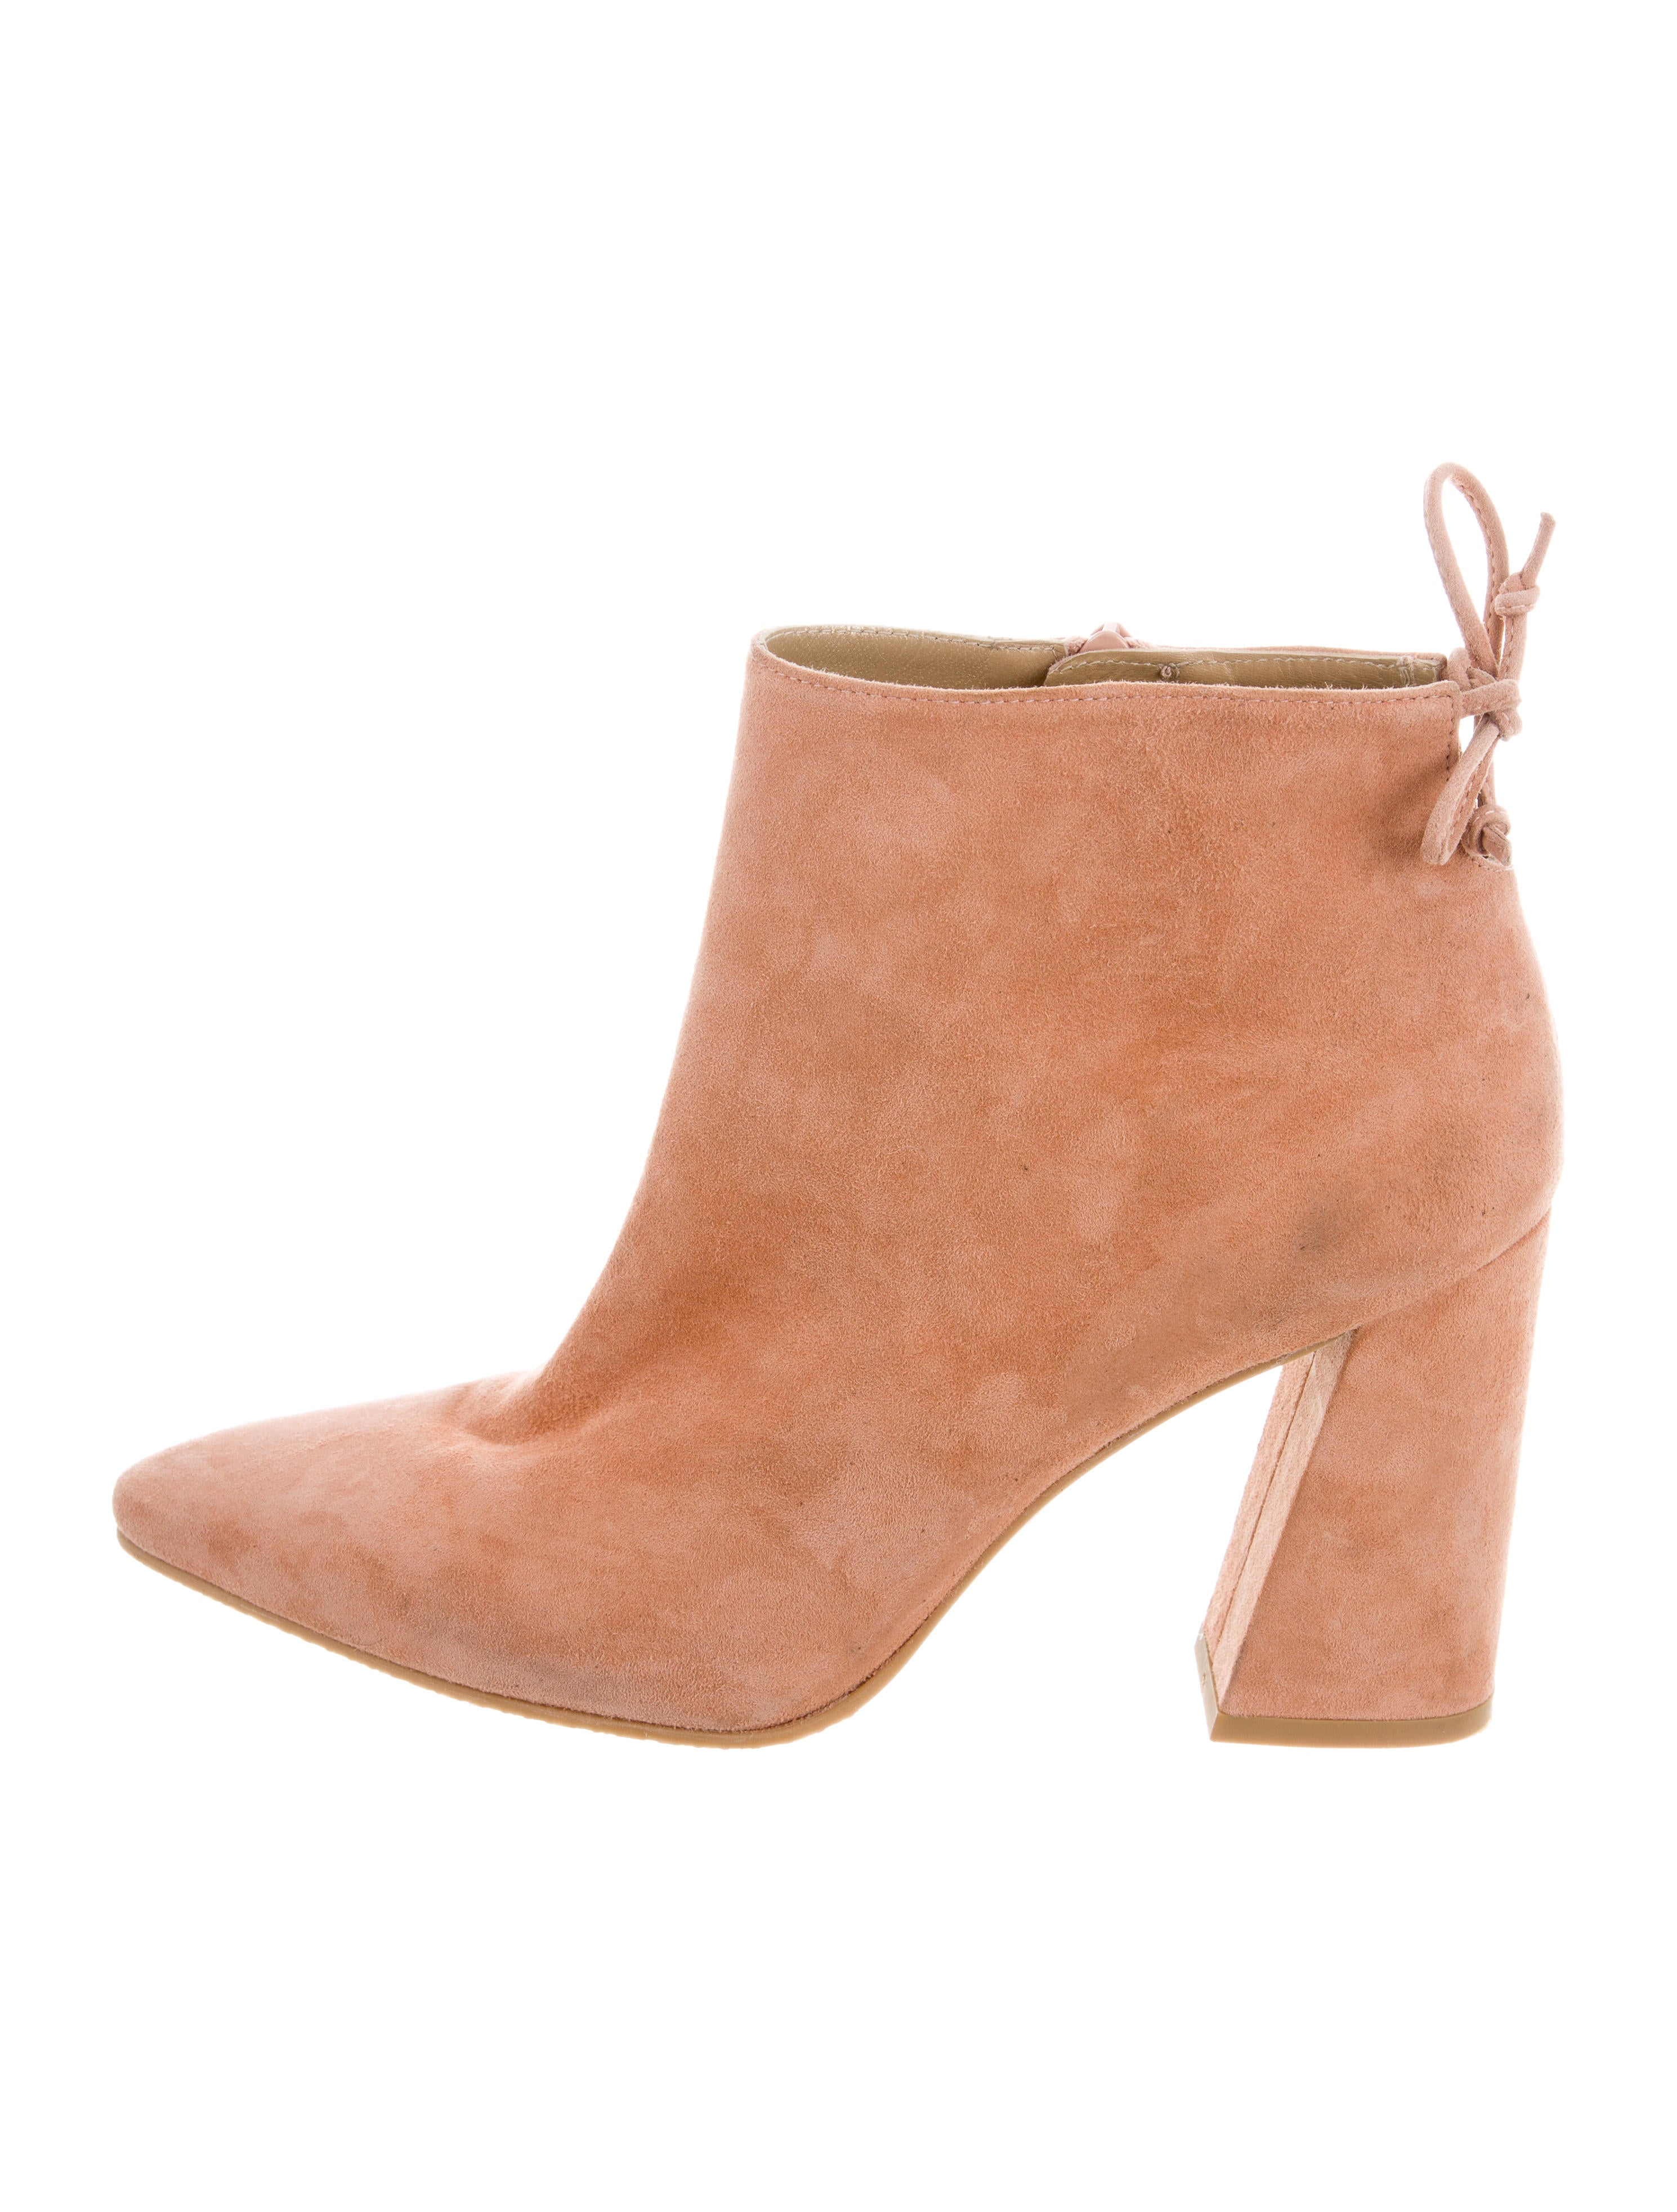 454c2eff314 Stuart Weitzman Grandiose Pointed-Toe Ankle Boots - Shoes - WSU42257 ...